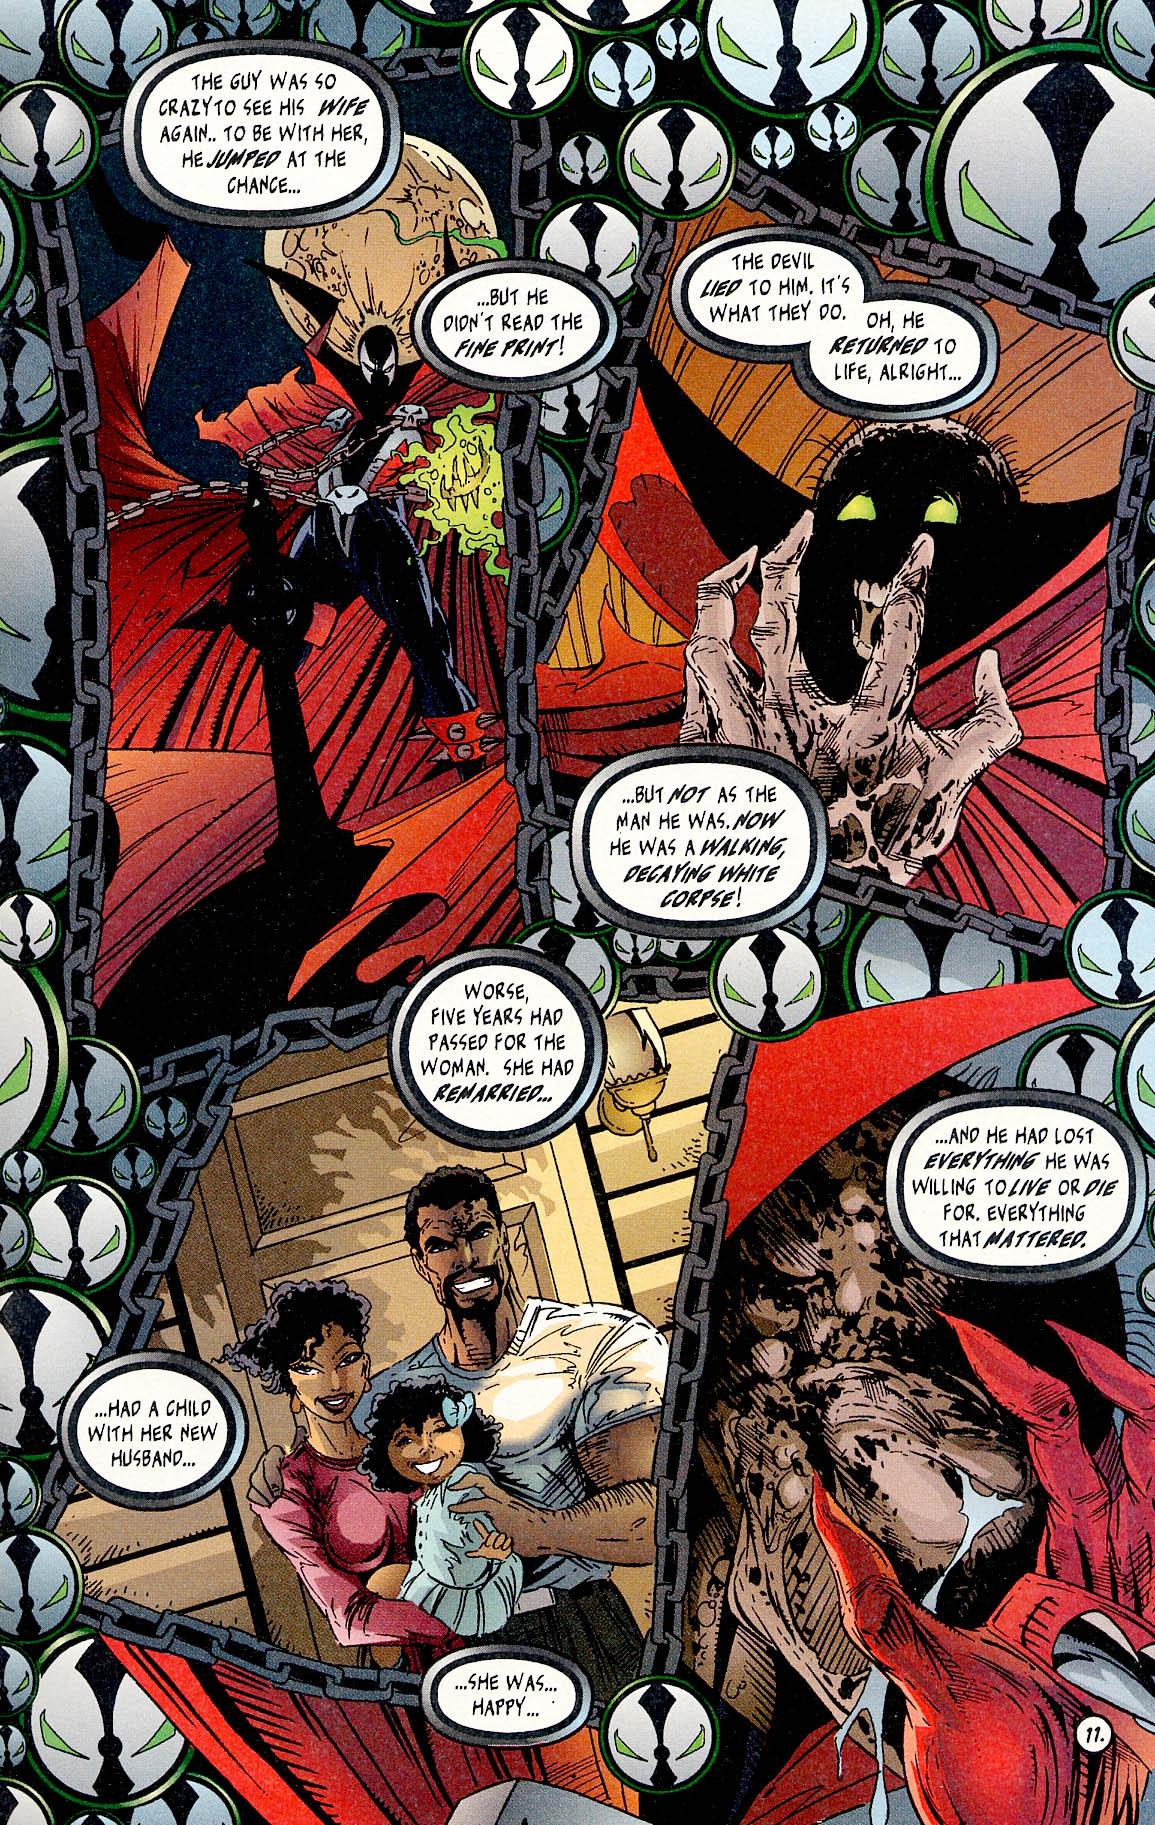 Read online ShadowHawk comic -  Issue #17 - 11